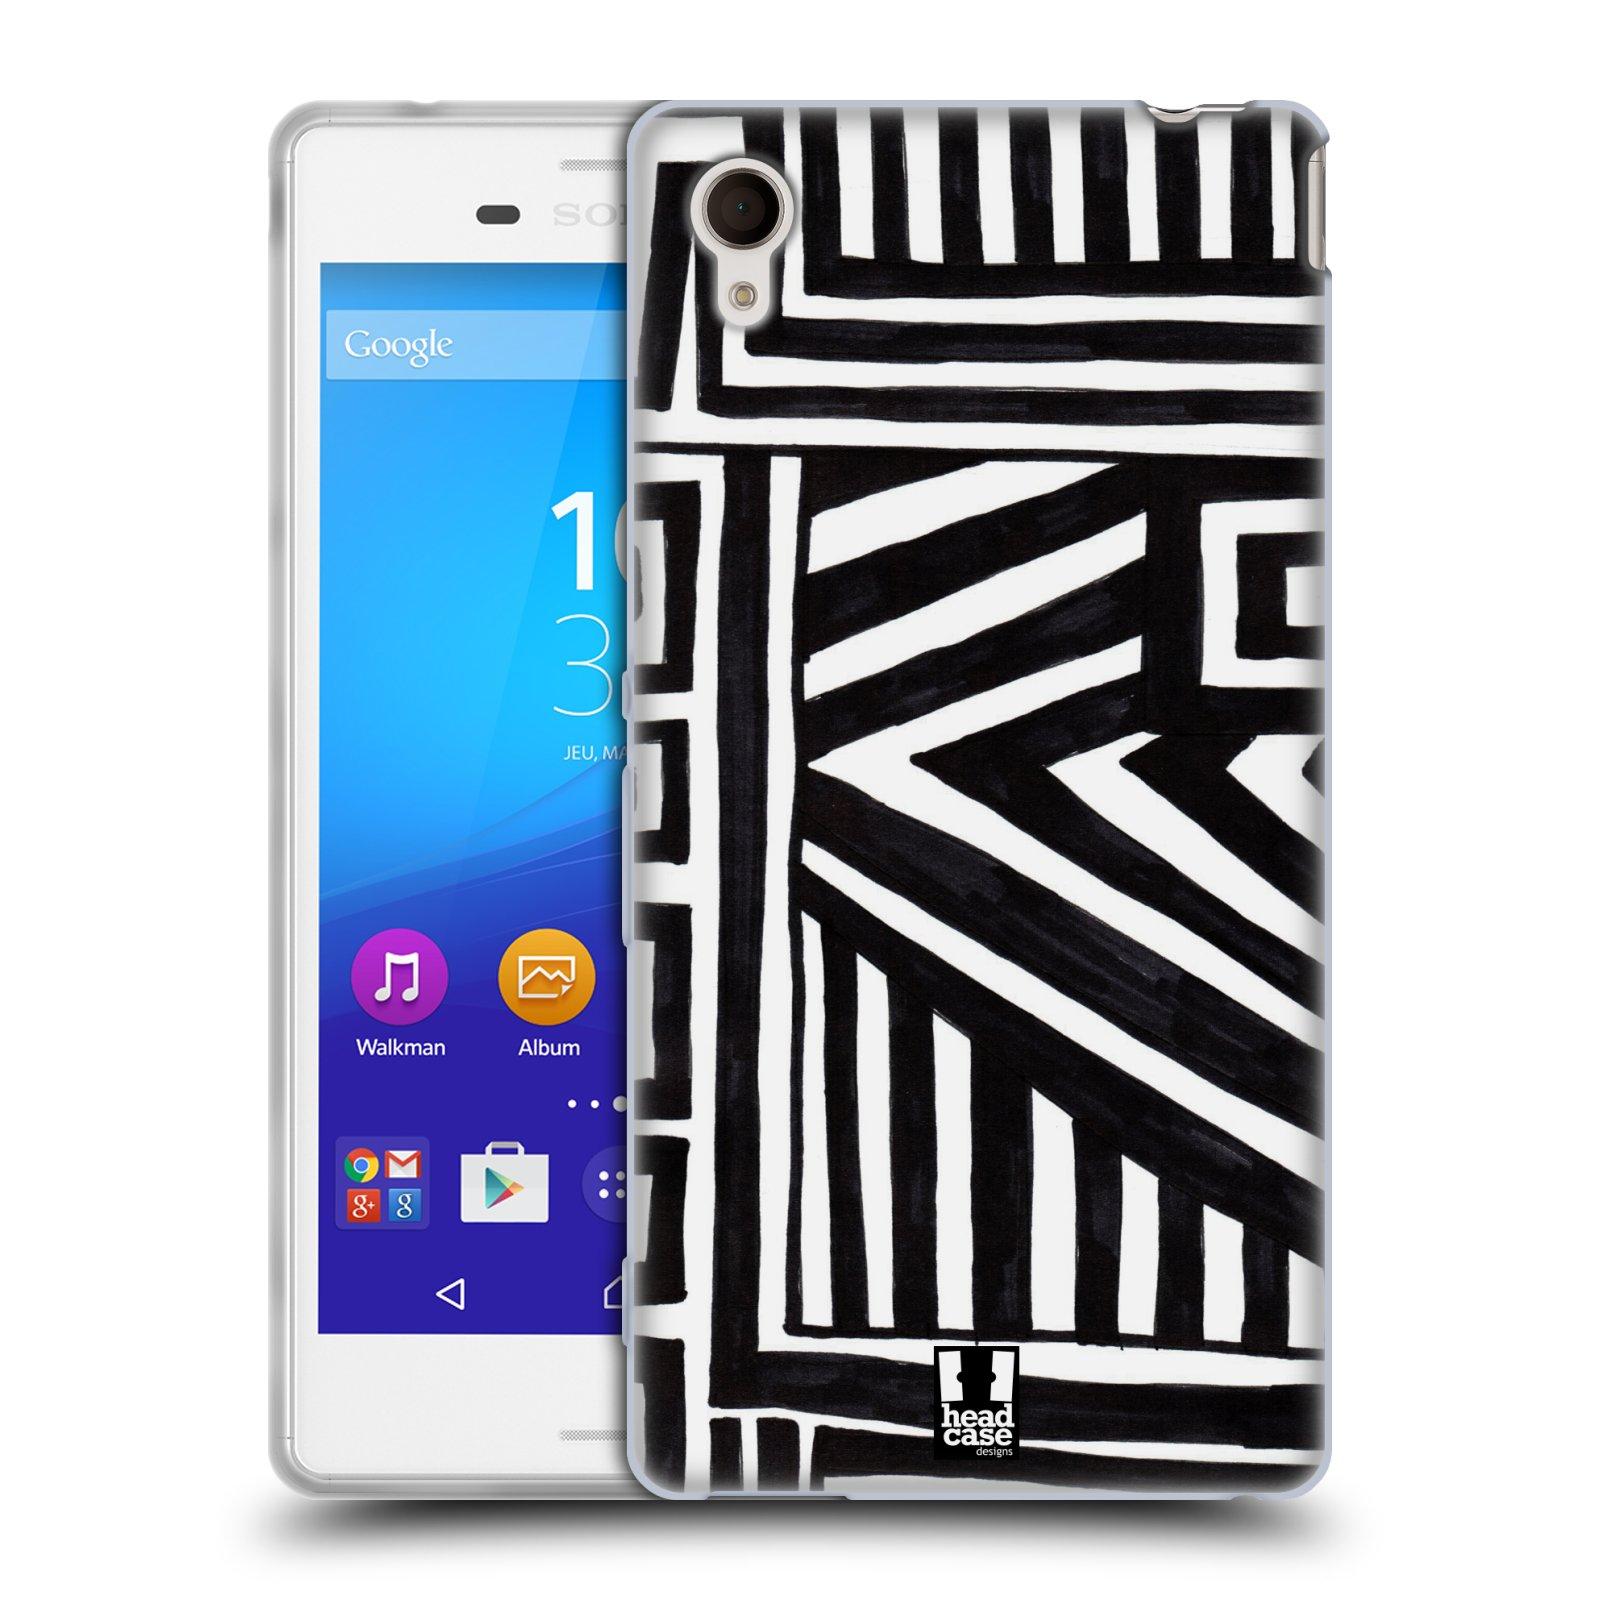 Silikonové pouzdro na mobil Sony Xperia M4 Aqua E2303 HEAD CASE DOODLE GEOMETRIC (Silikonový kryt či obal na mobilní telefon Sony Xperia M4 Aqua a M4 Aqua Dual SIM)